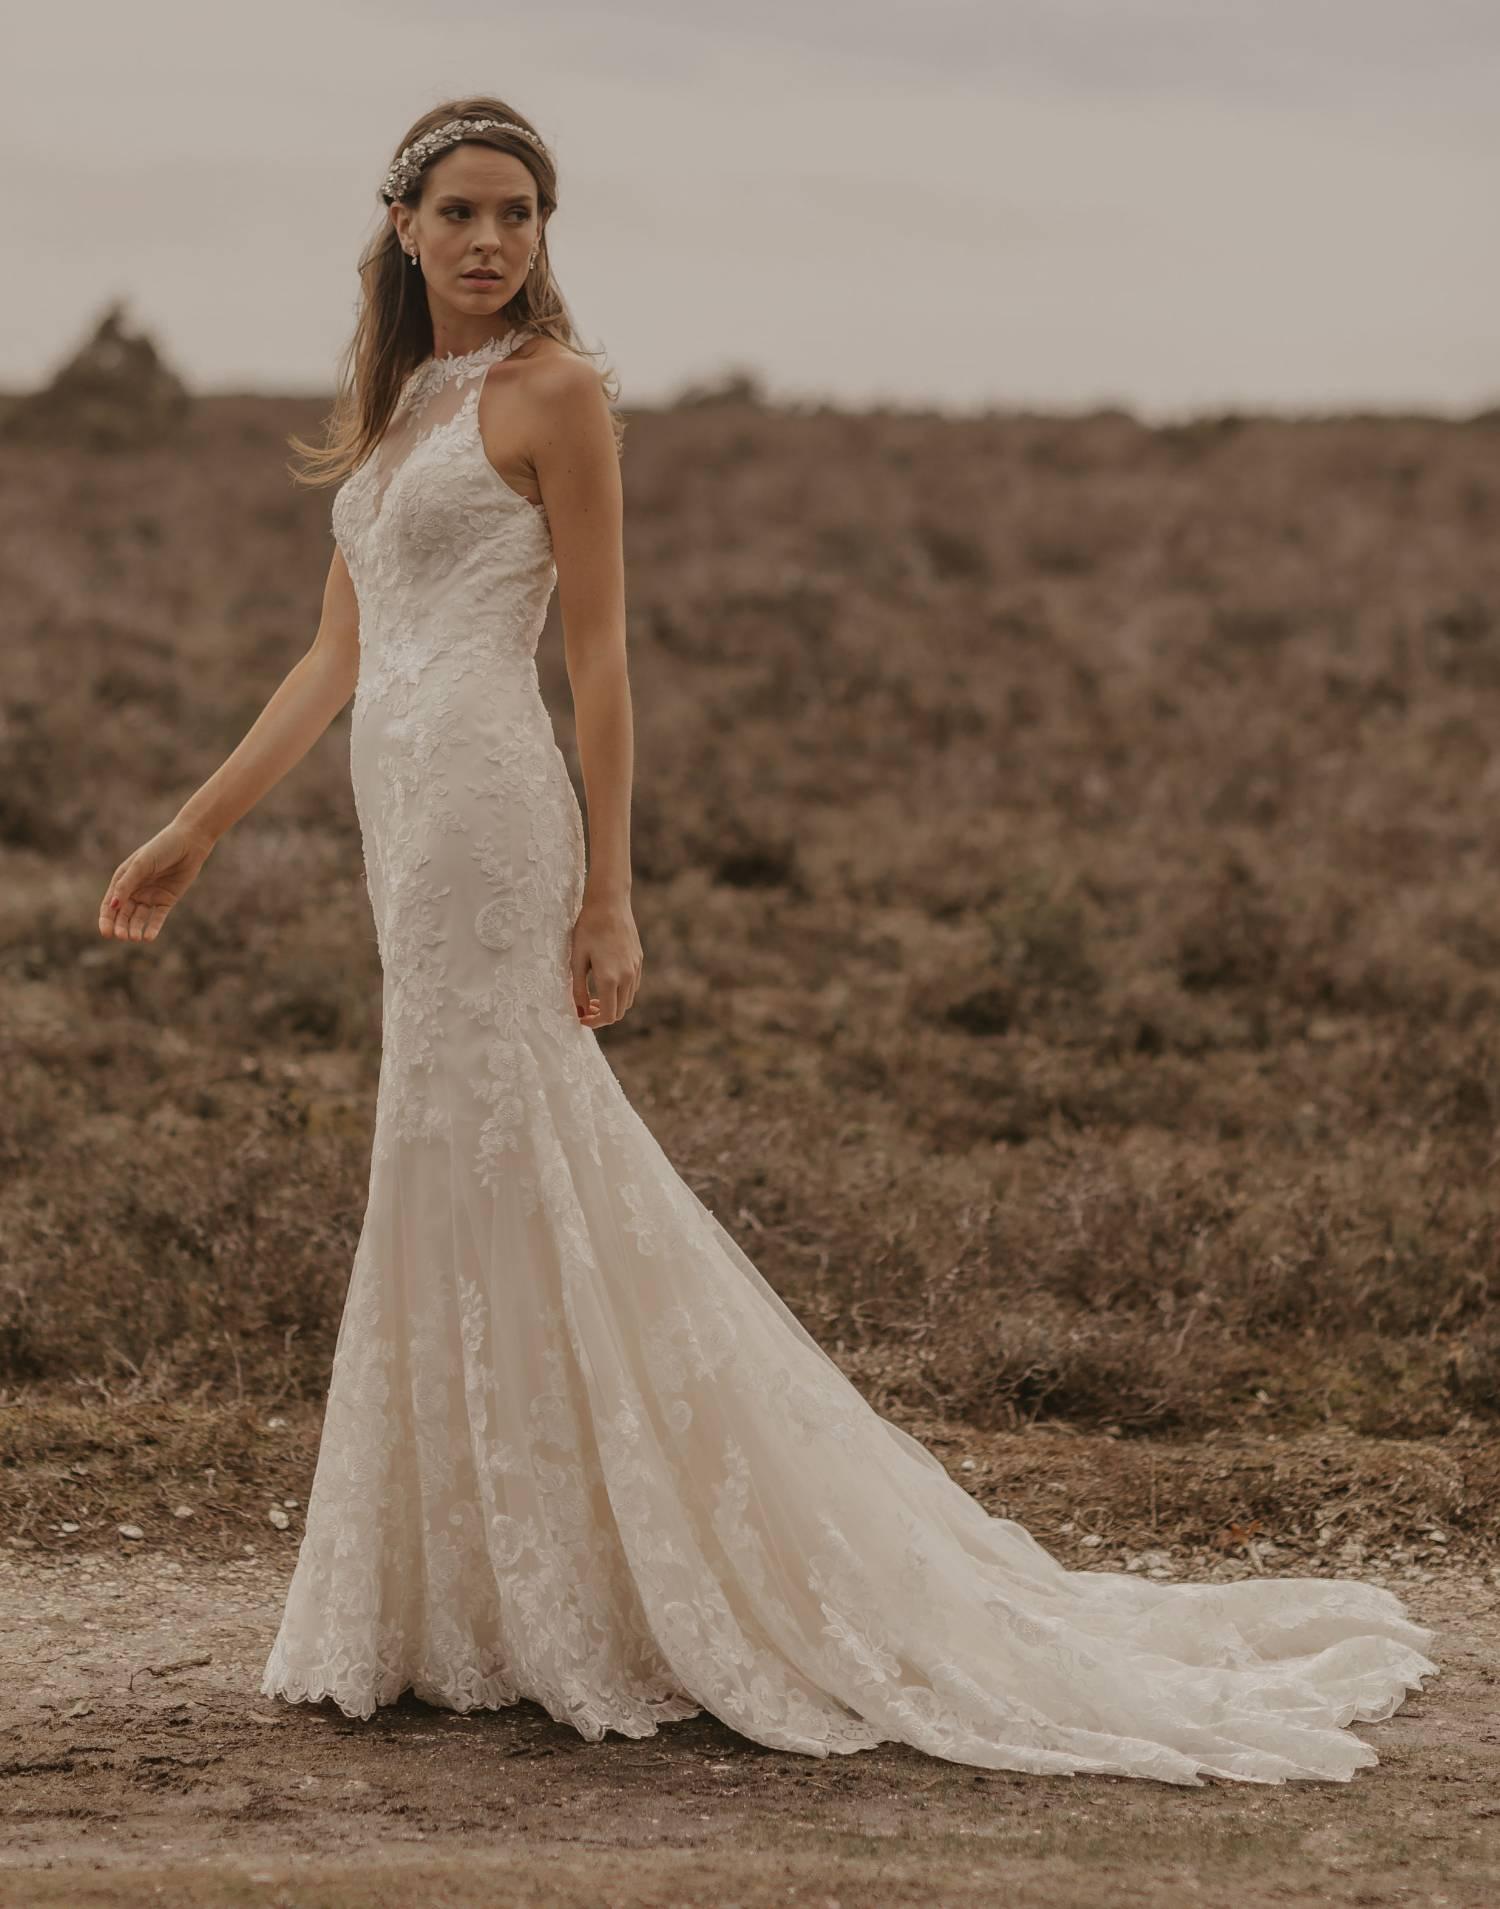 Solana-wedding-dress-Tiffanys-front-view-min